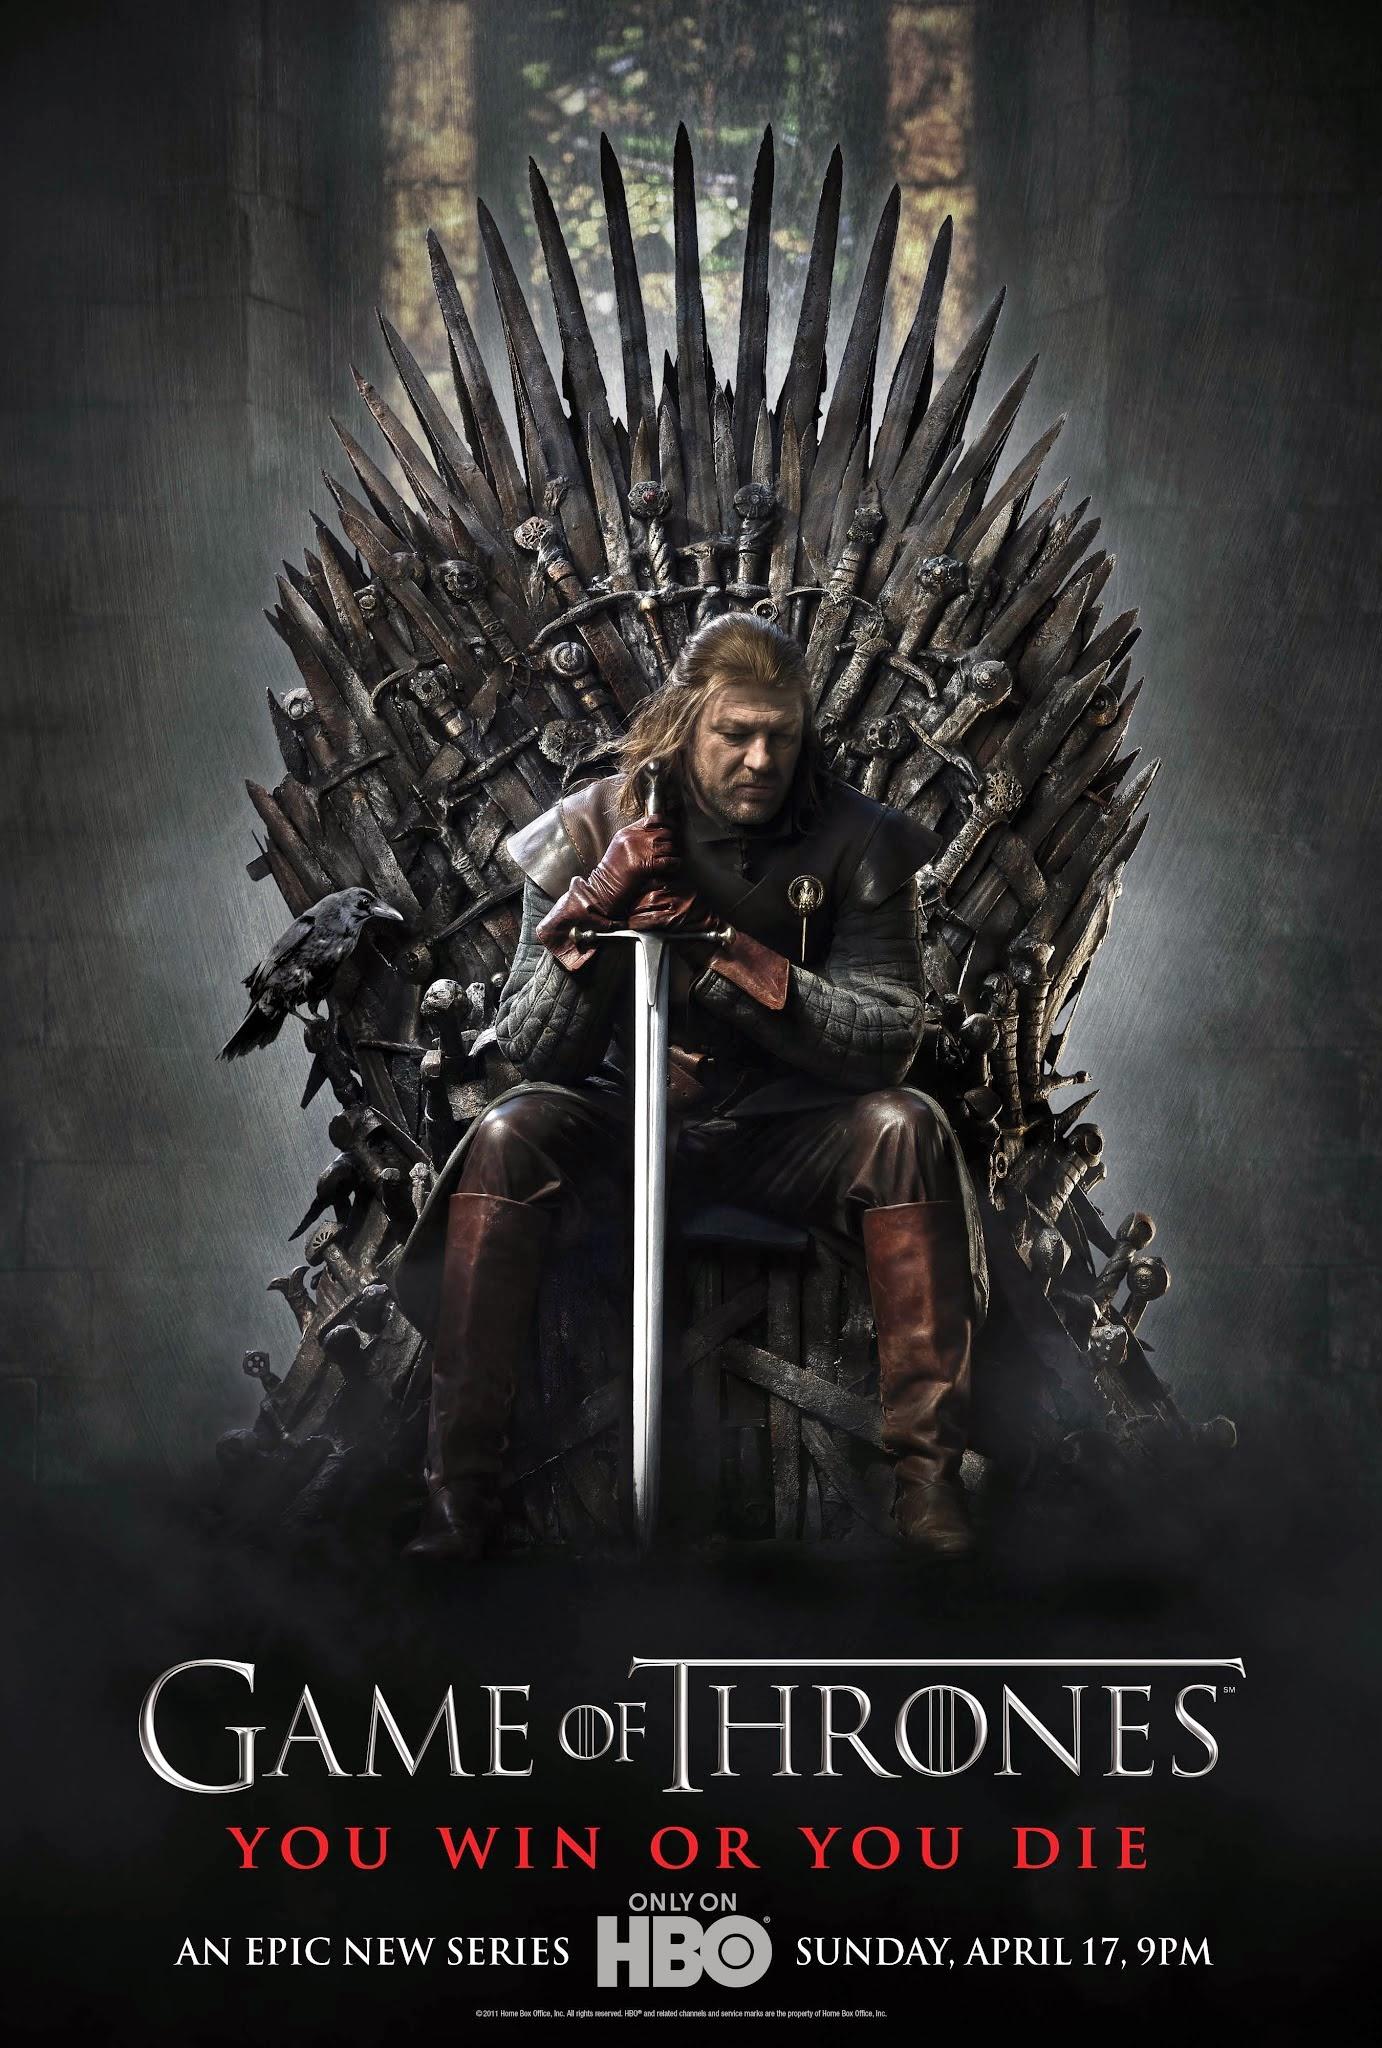 gra o tron plakat recenzja serialu HBO stark lannister sean bean